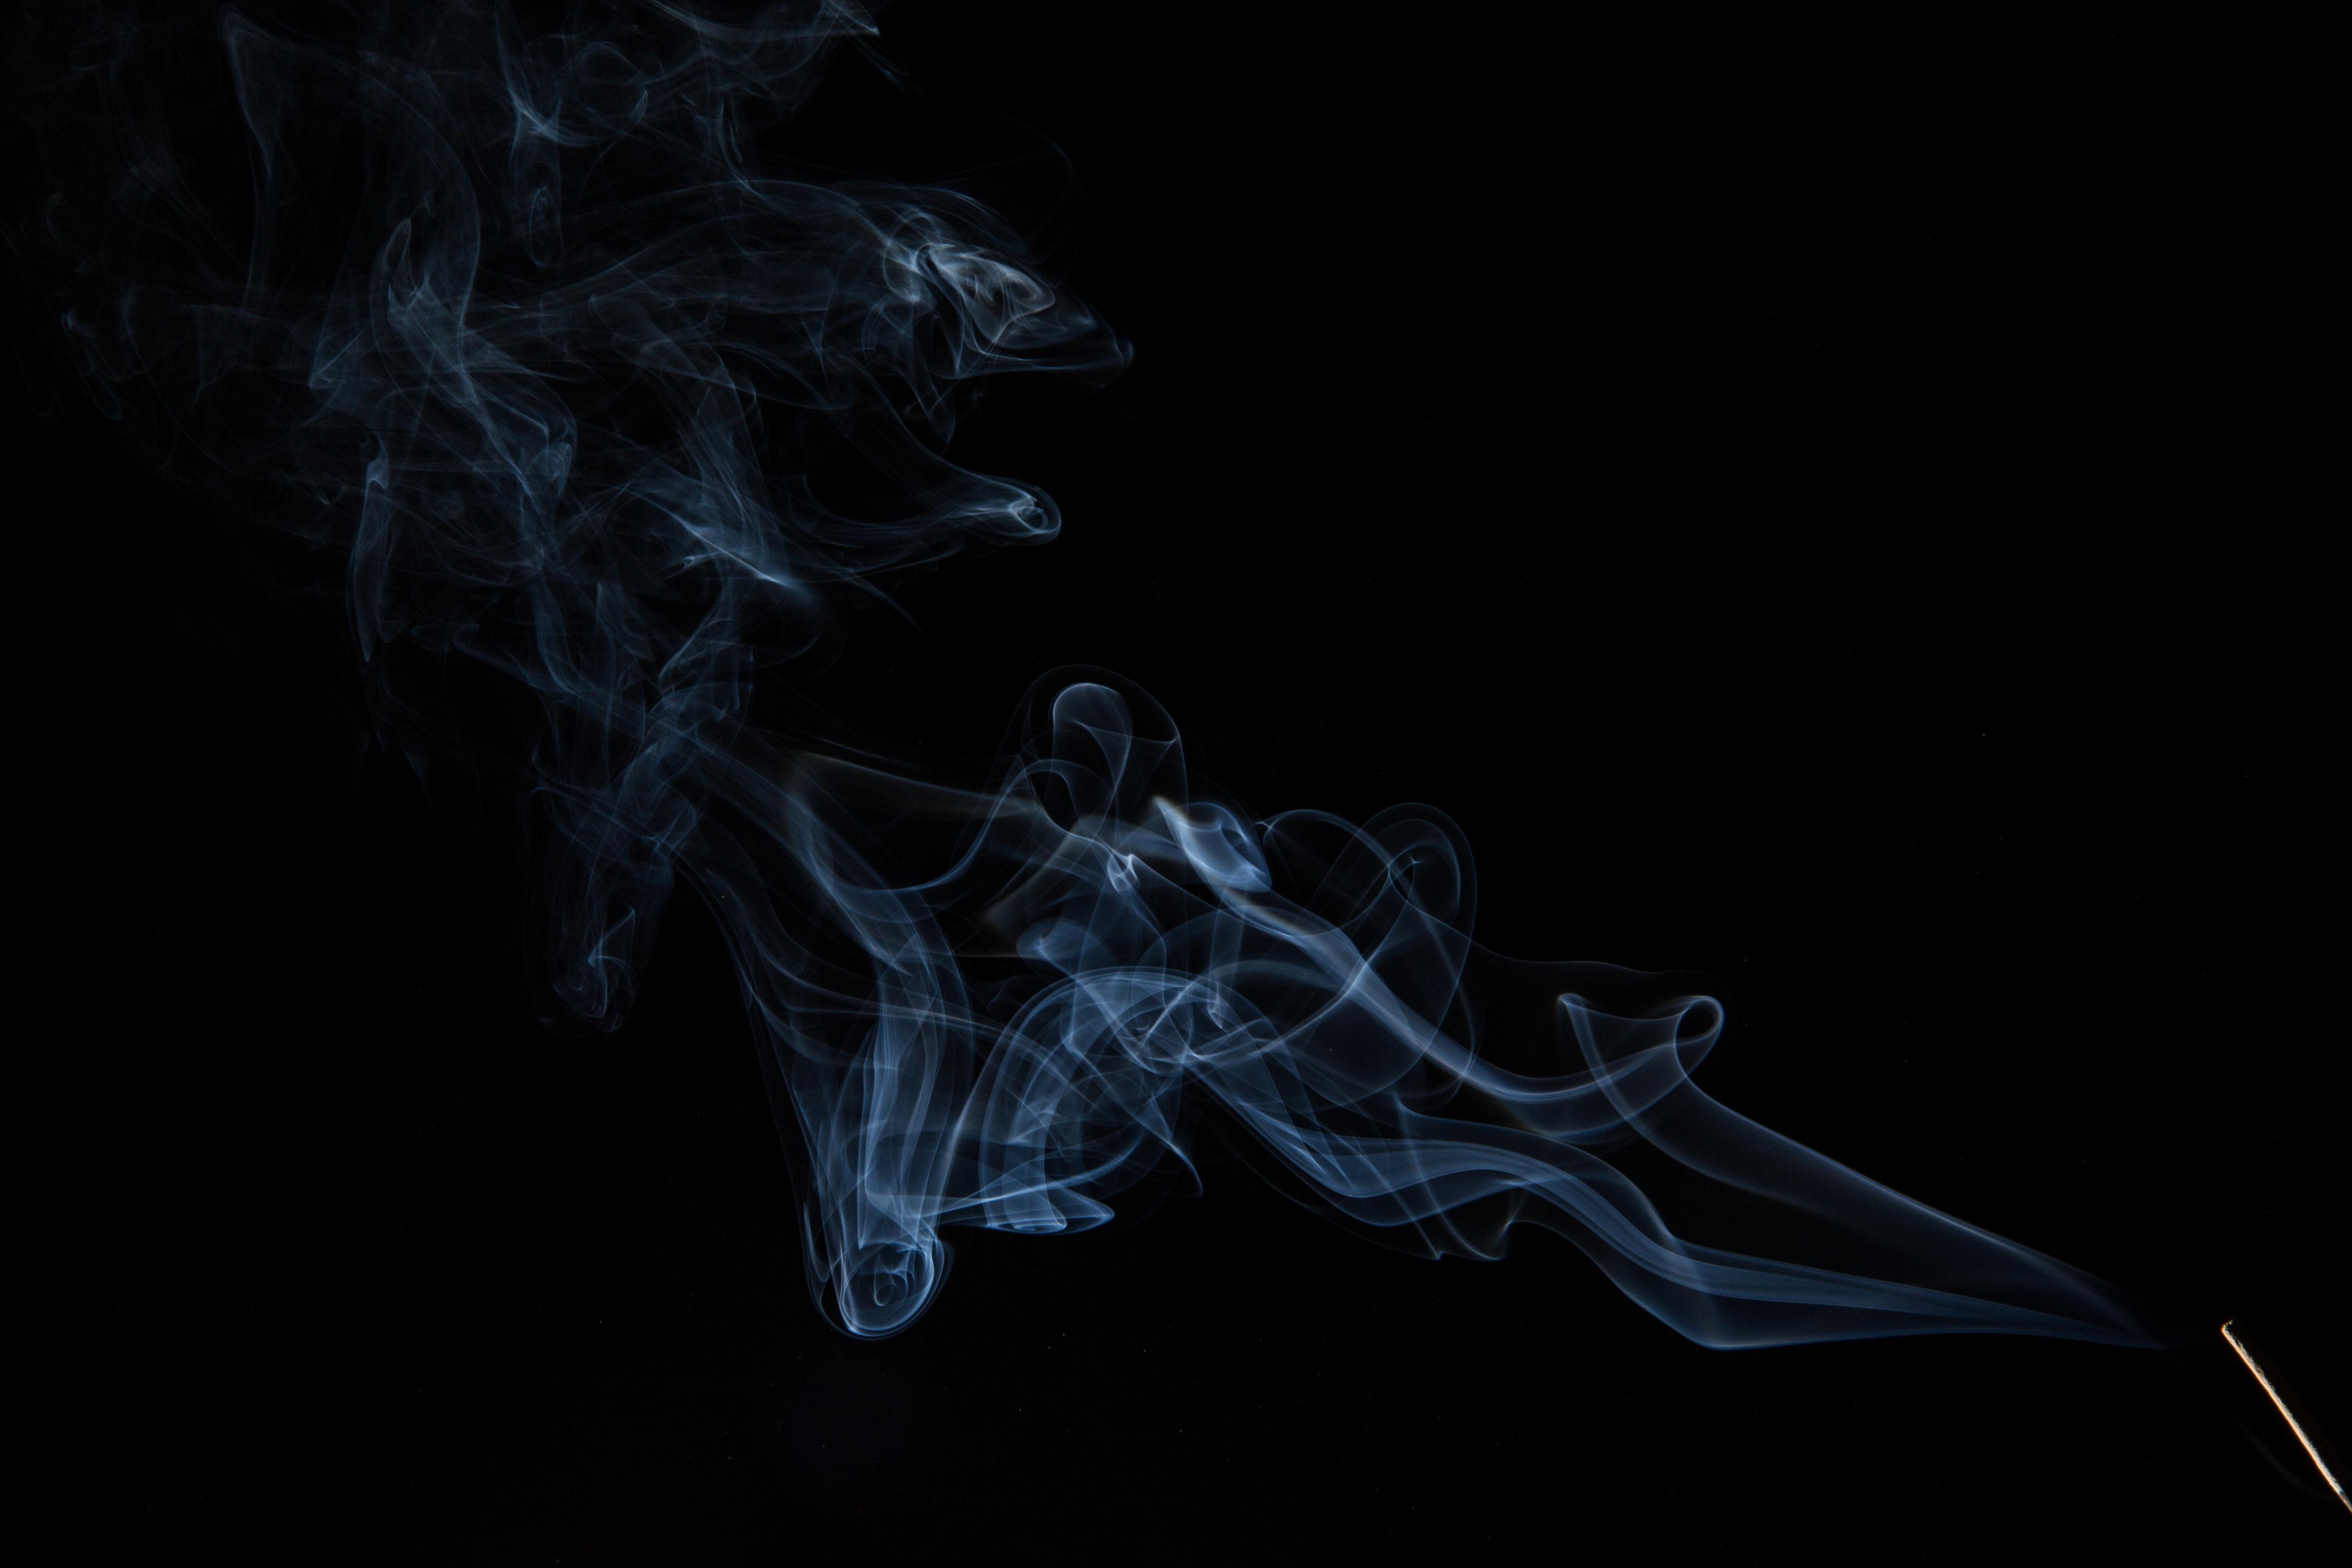 500 Great Smoke Photos Pexels Free Stock Photos